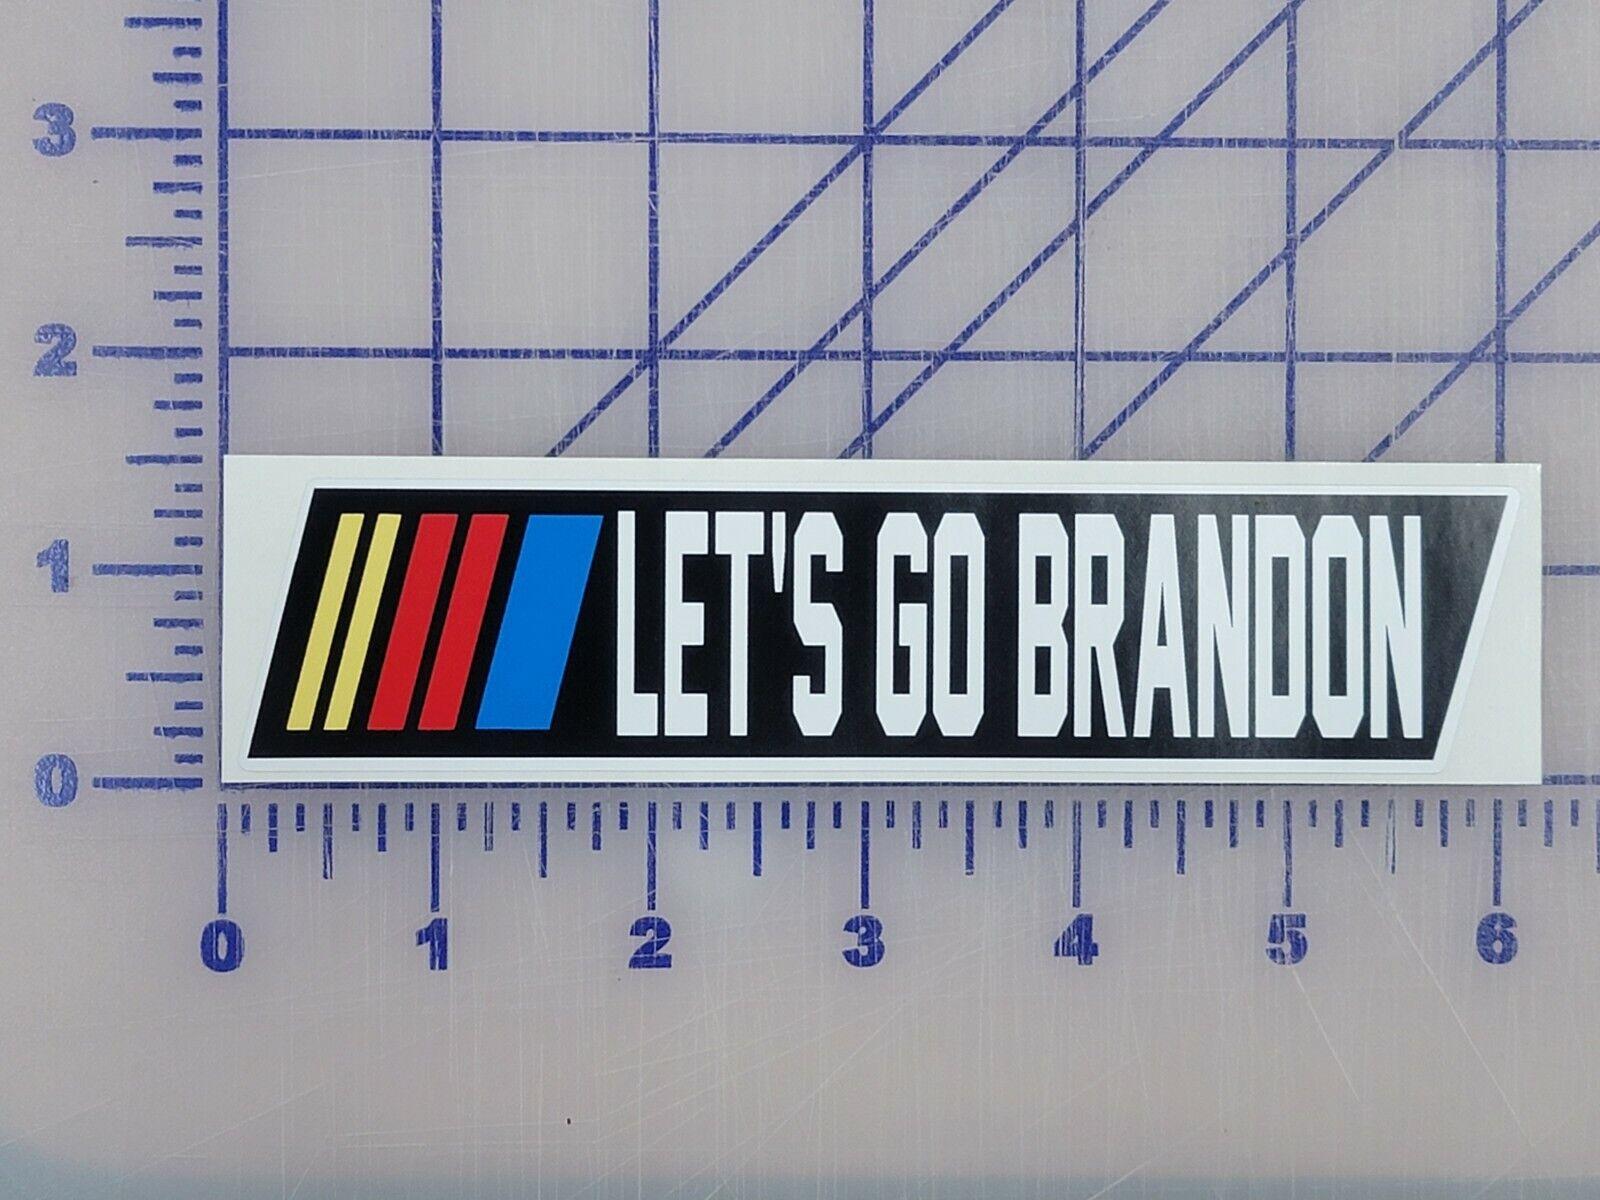 "Let's Go Brandon #FJB Vinyl Decal Sticker Save America 6"" outdoor bumper sticker"